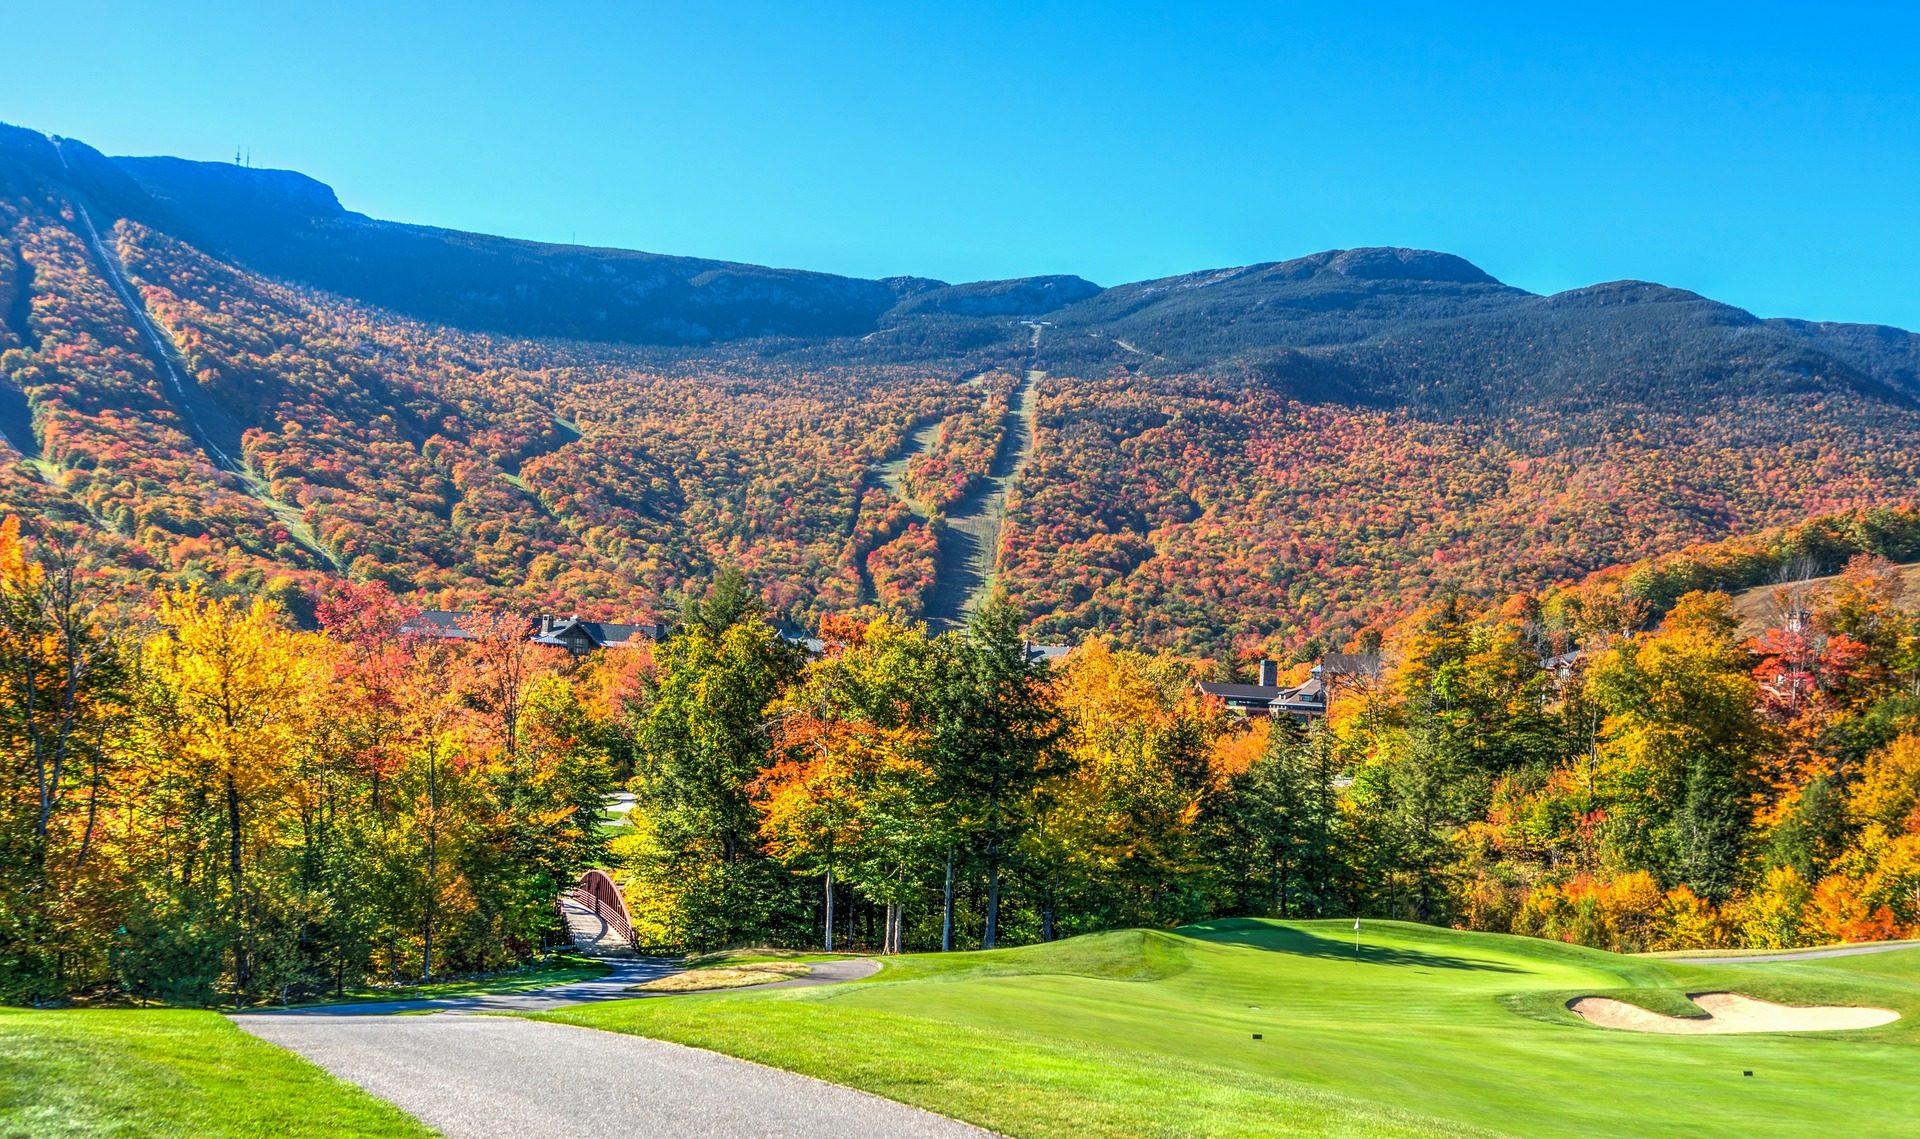 Wald, Feld, Laub, Montañas, Vermont - Wallpaper HD - Prof.-falken.com